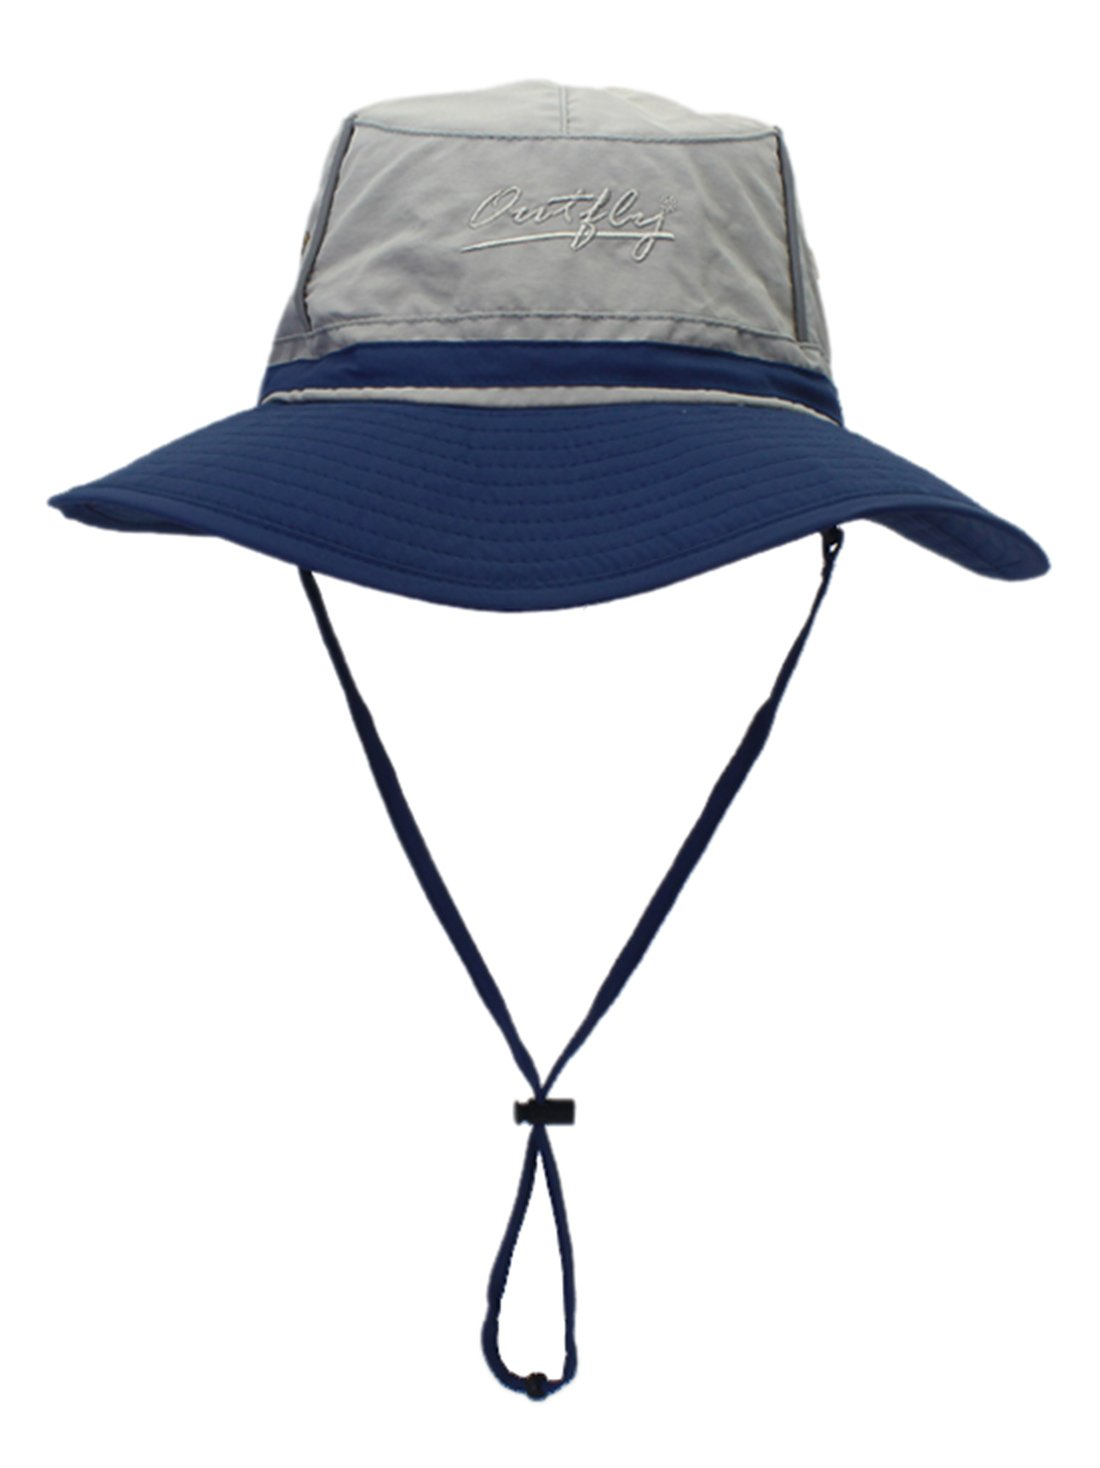 Panegy Outdoor Summer Sun Hats Fishing Anti-UV Ultralight Fashion Colorblock Boonie Bucket Hats 360°Solar Protection